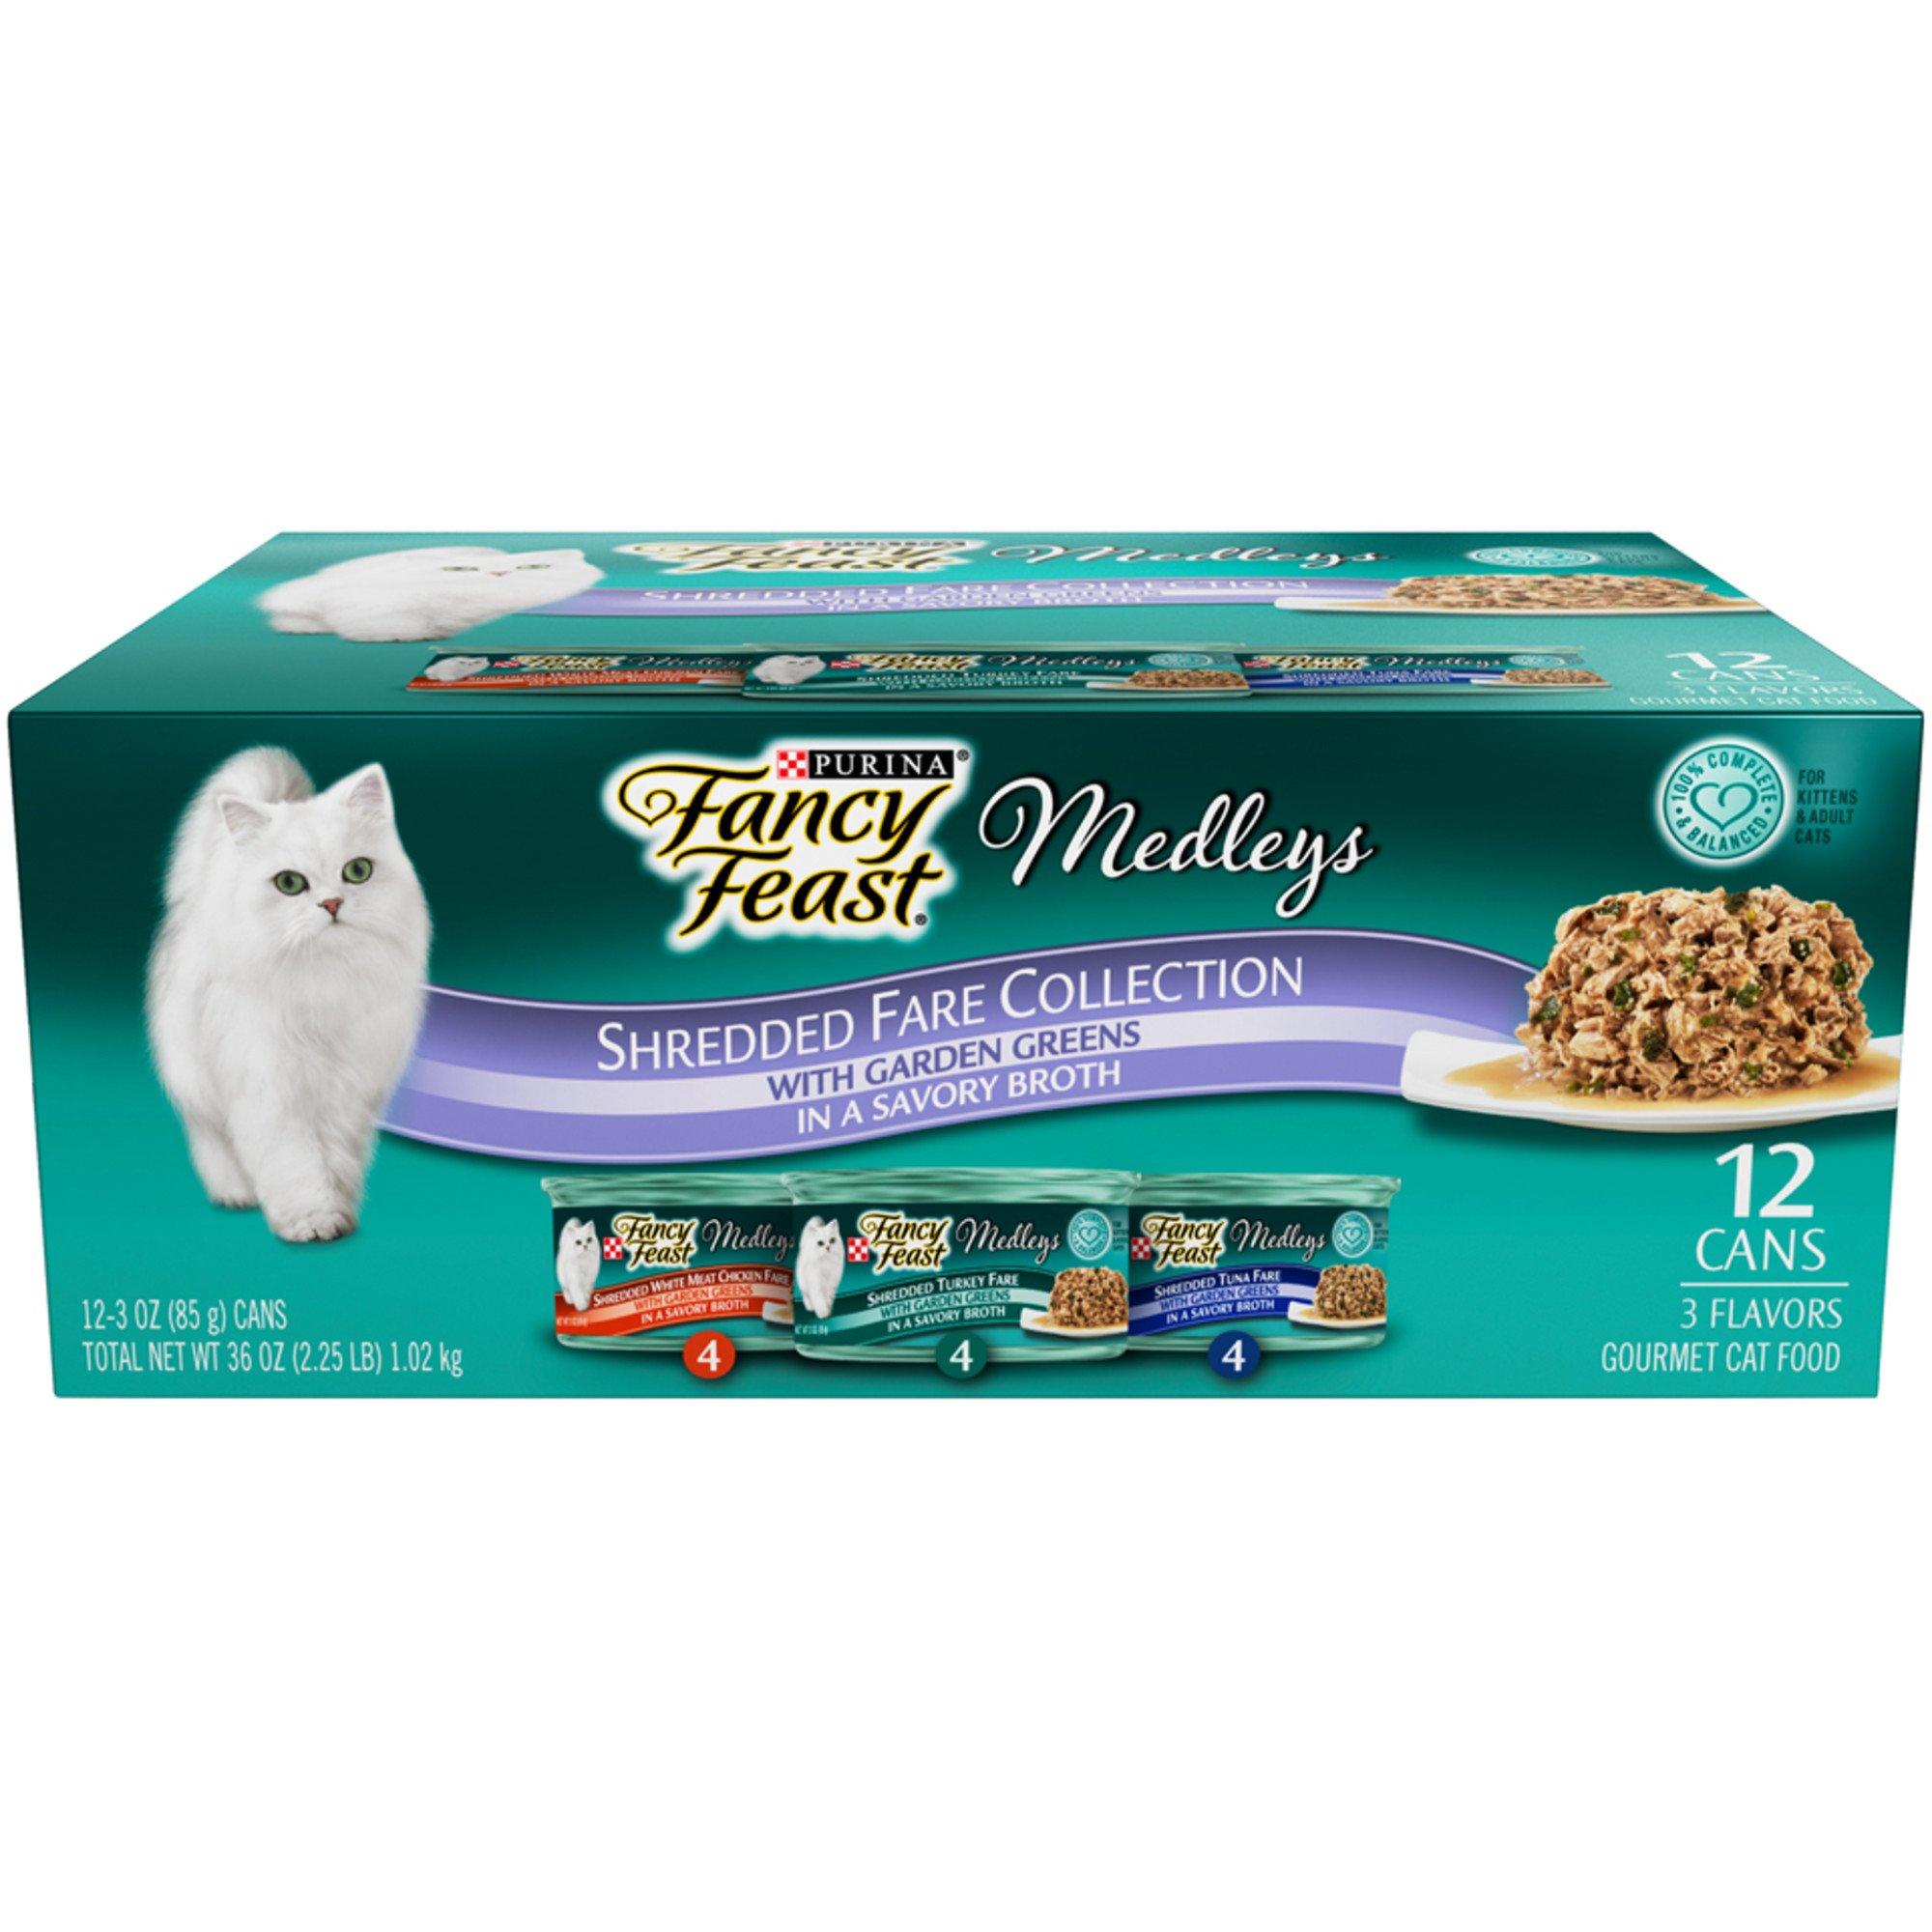 Fancy Feast Elegant Medleys Shredded Canned Cat Food